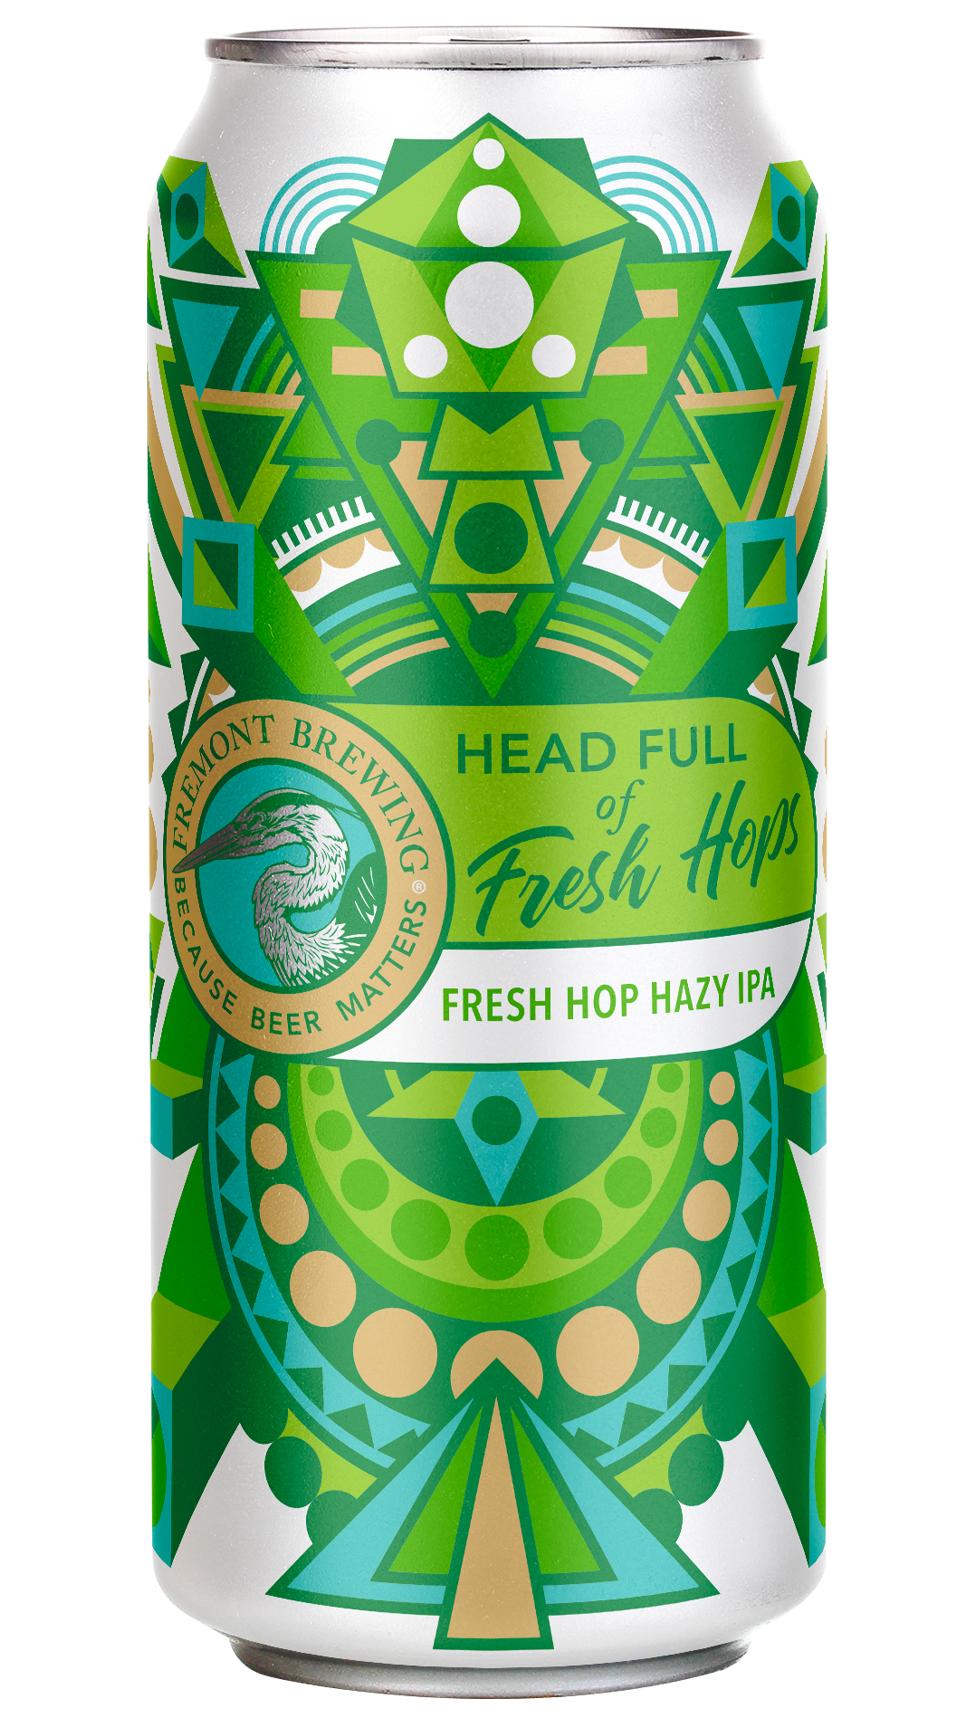 Head Full of Fresh Hops can